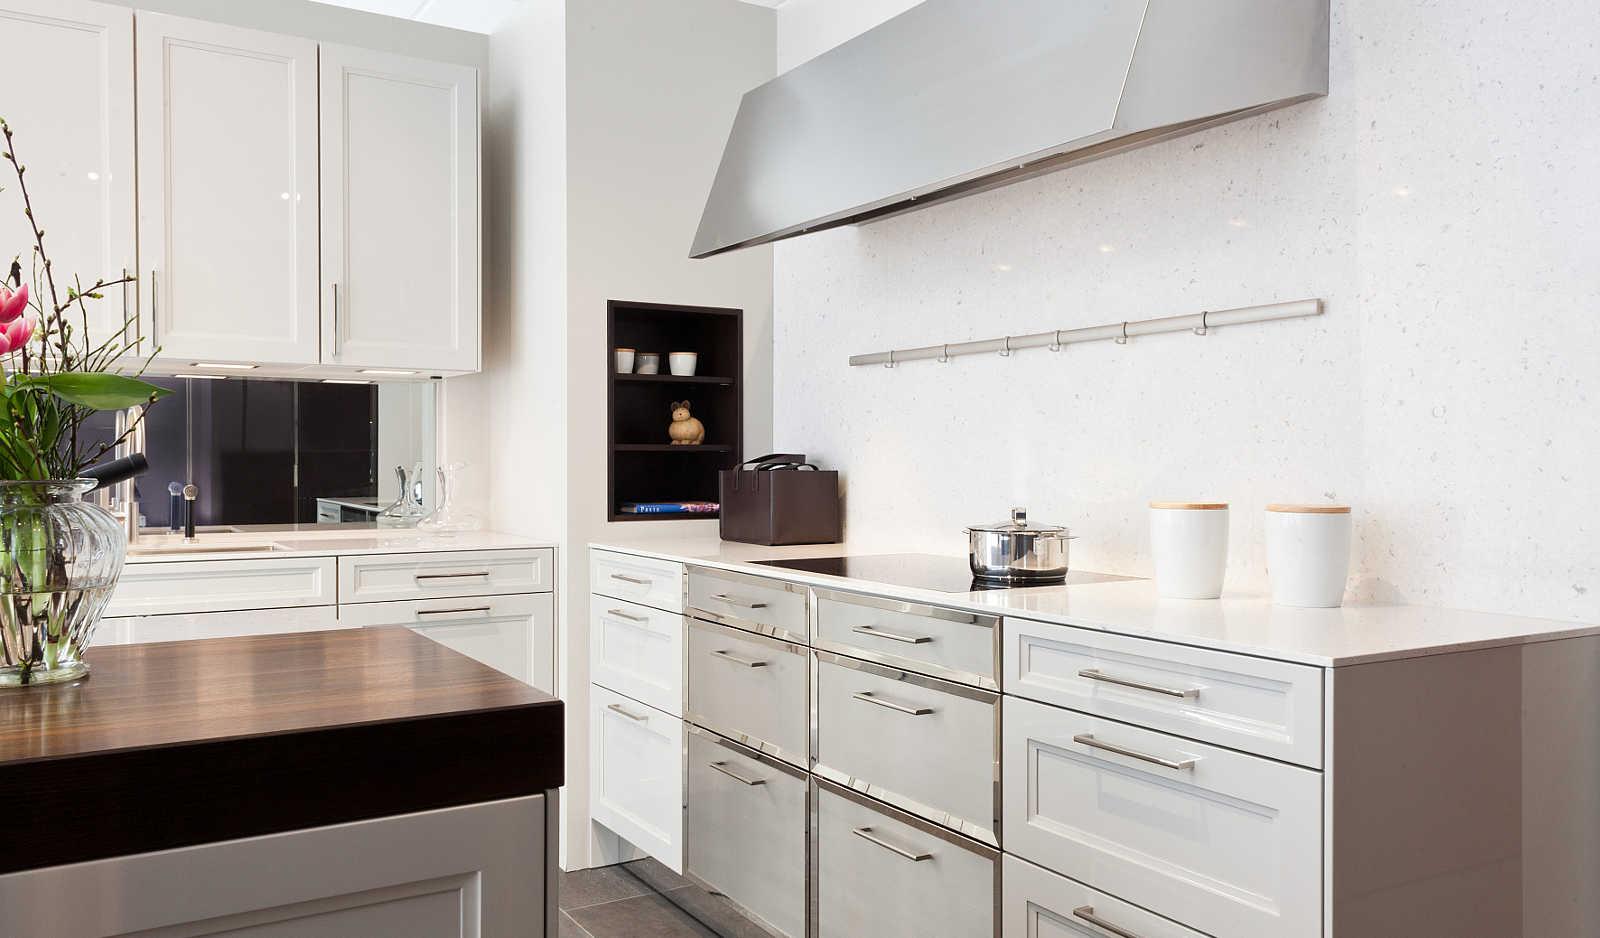 k chenausstellung k chen galerie bonn. Black Bedroom Furniture Sets. Home Design Ideas